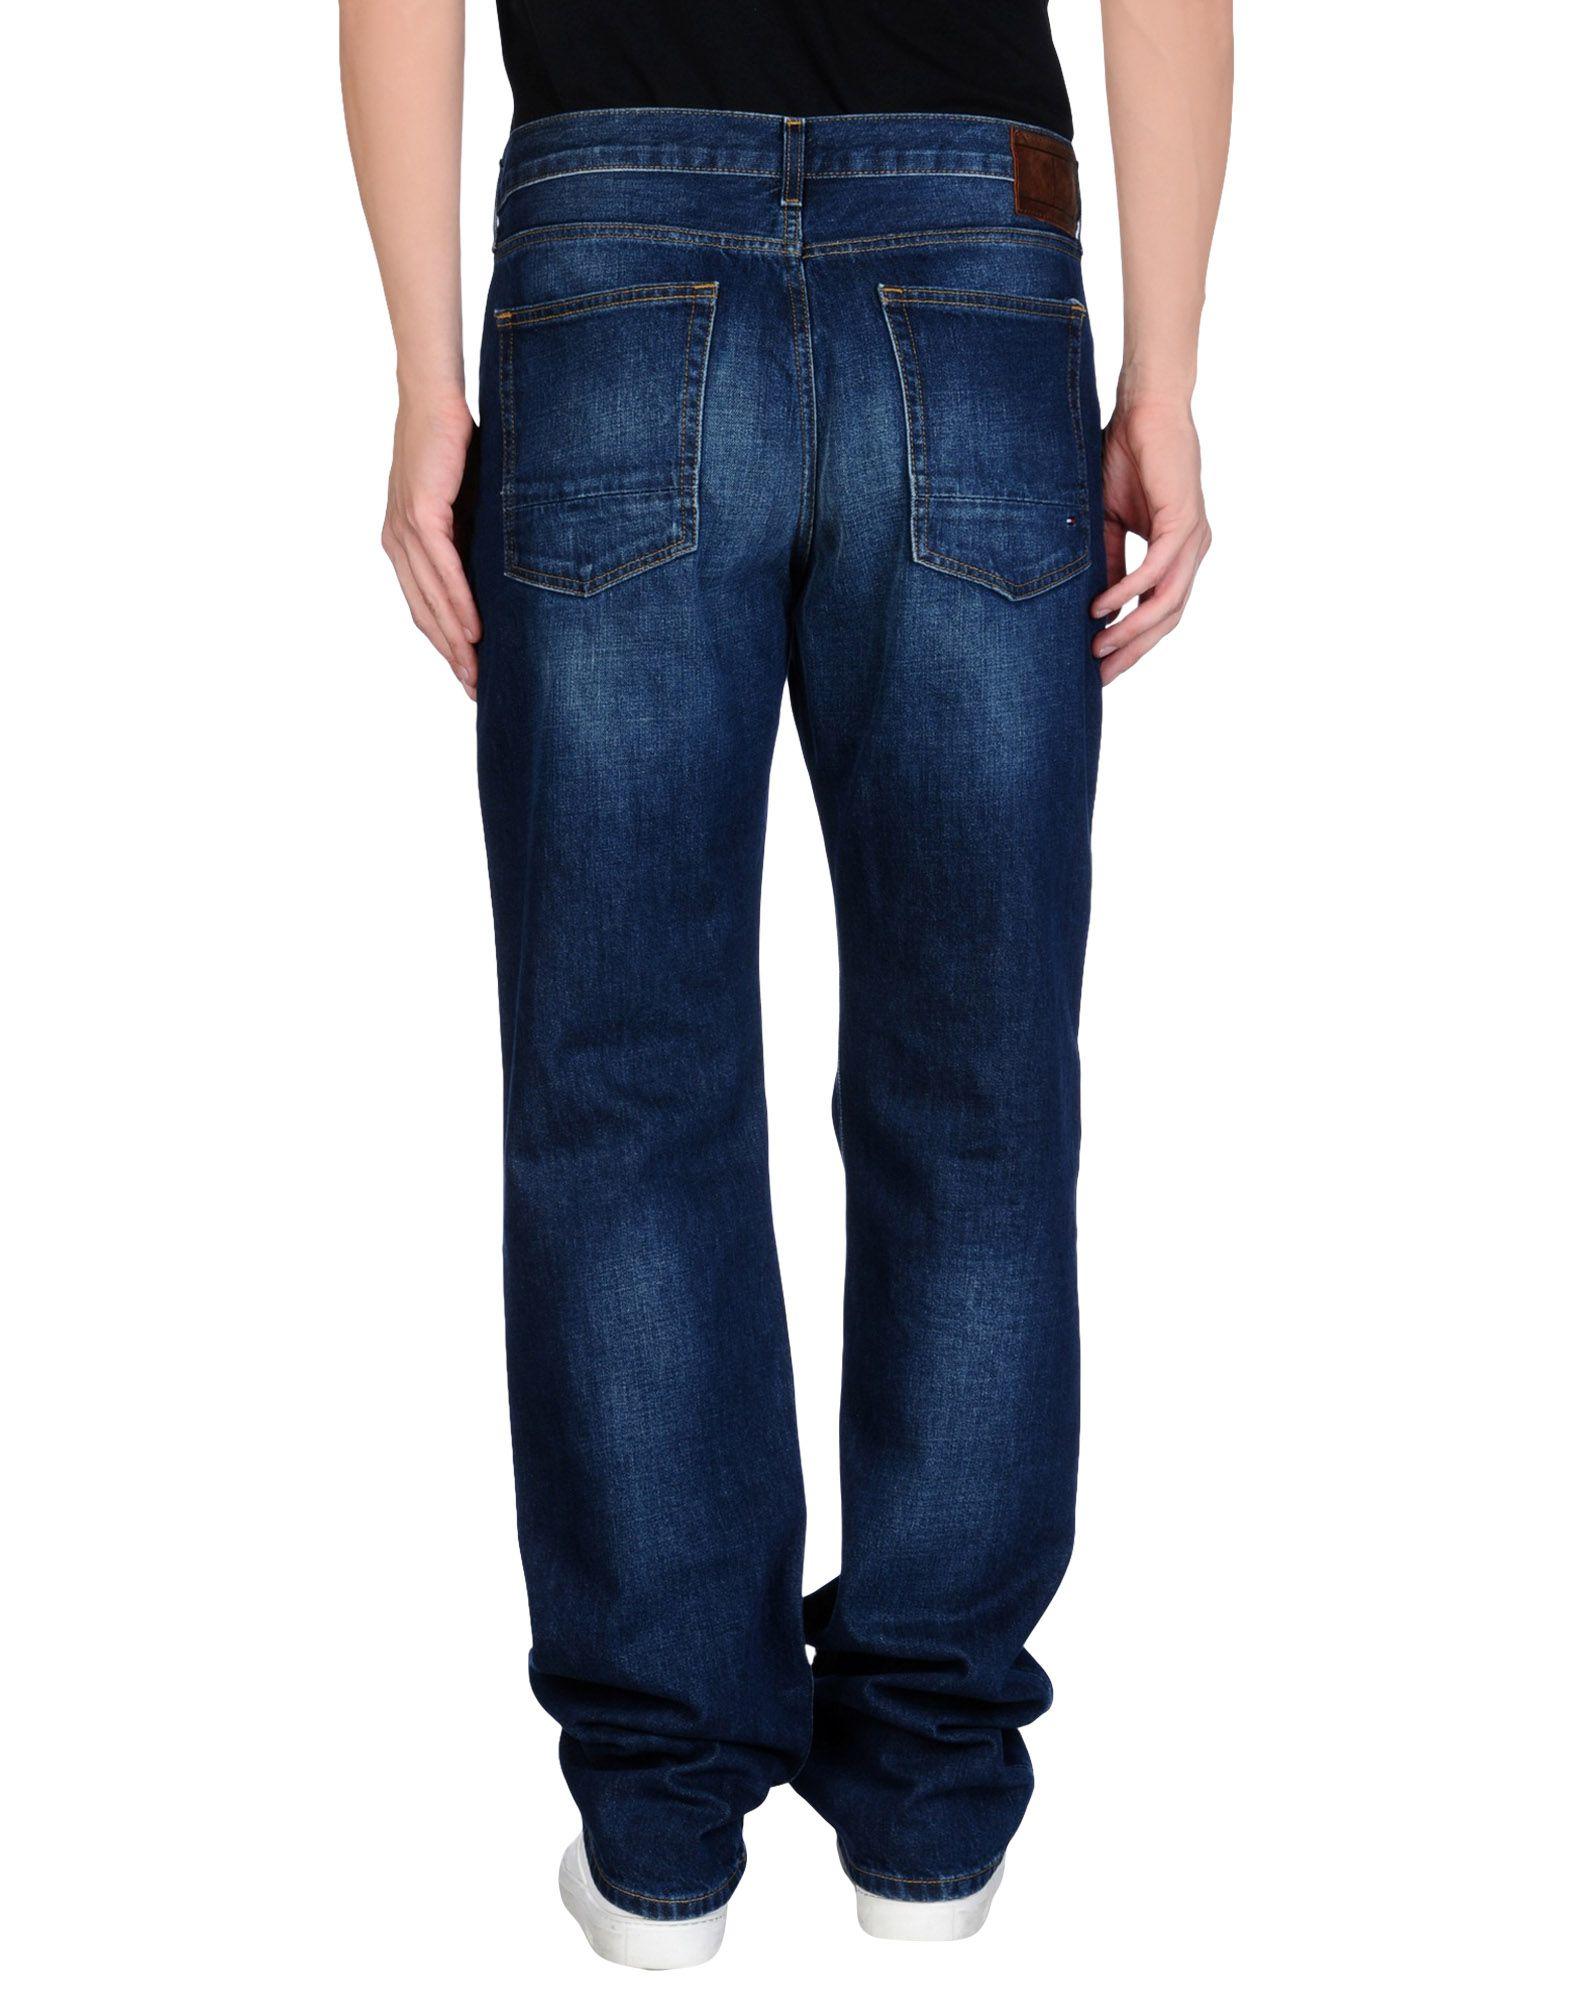 Lyst - Tommy Hilfiger Denim Trousers in Blue for Men